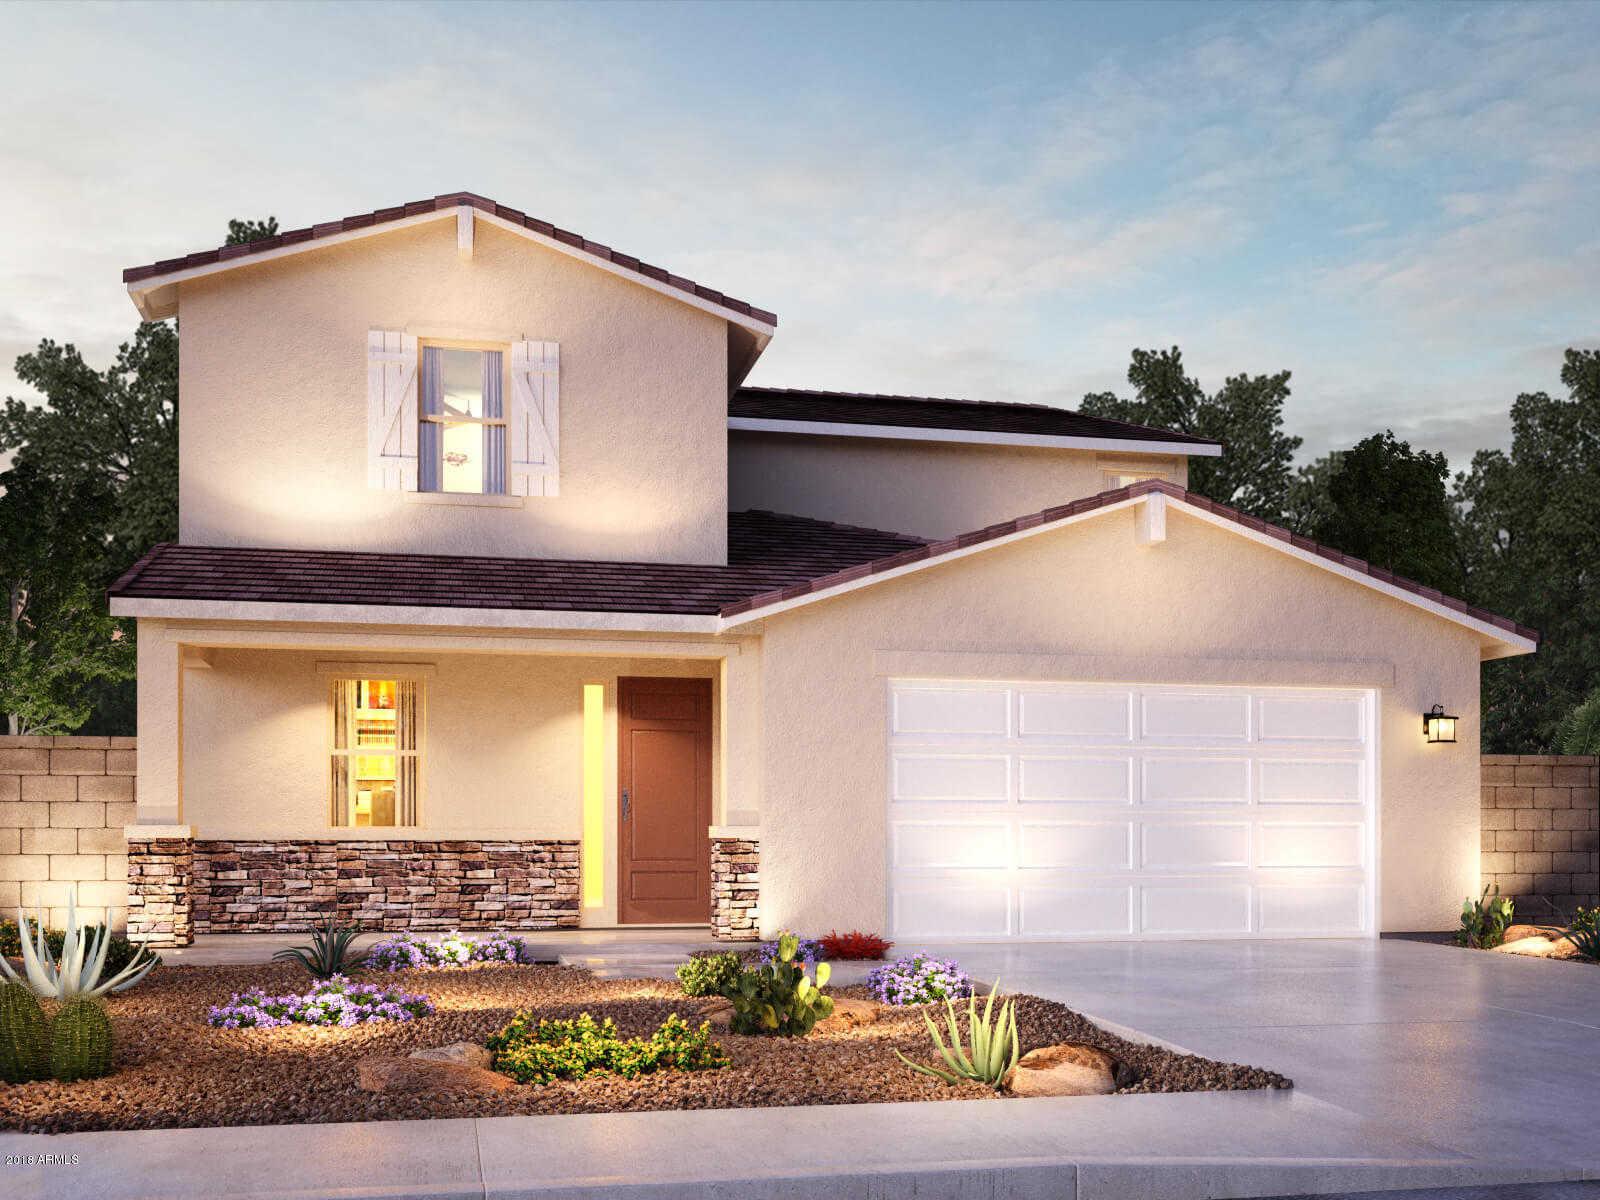 $324,495 - 5Br/3Ba - Home for Sale in Marbella Ranch Parcel 1, Glendale